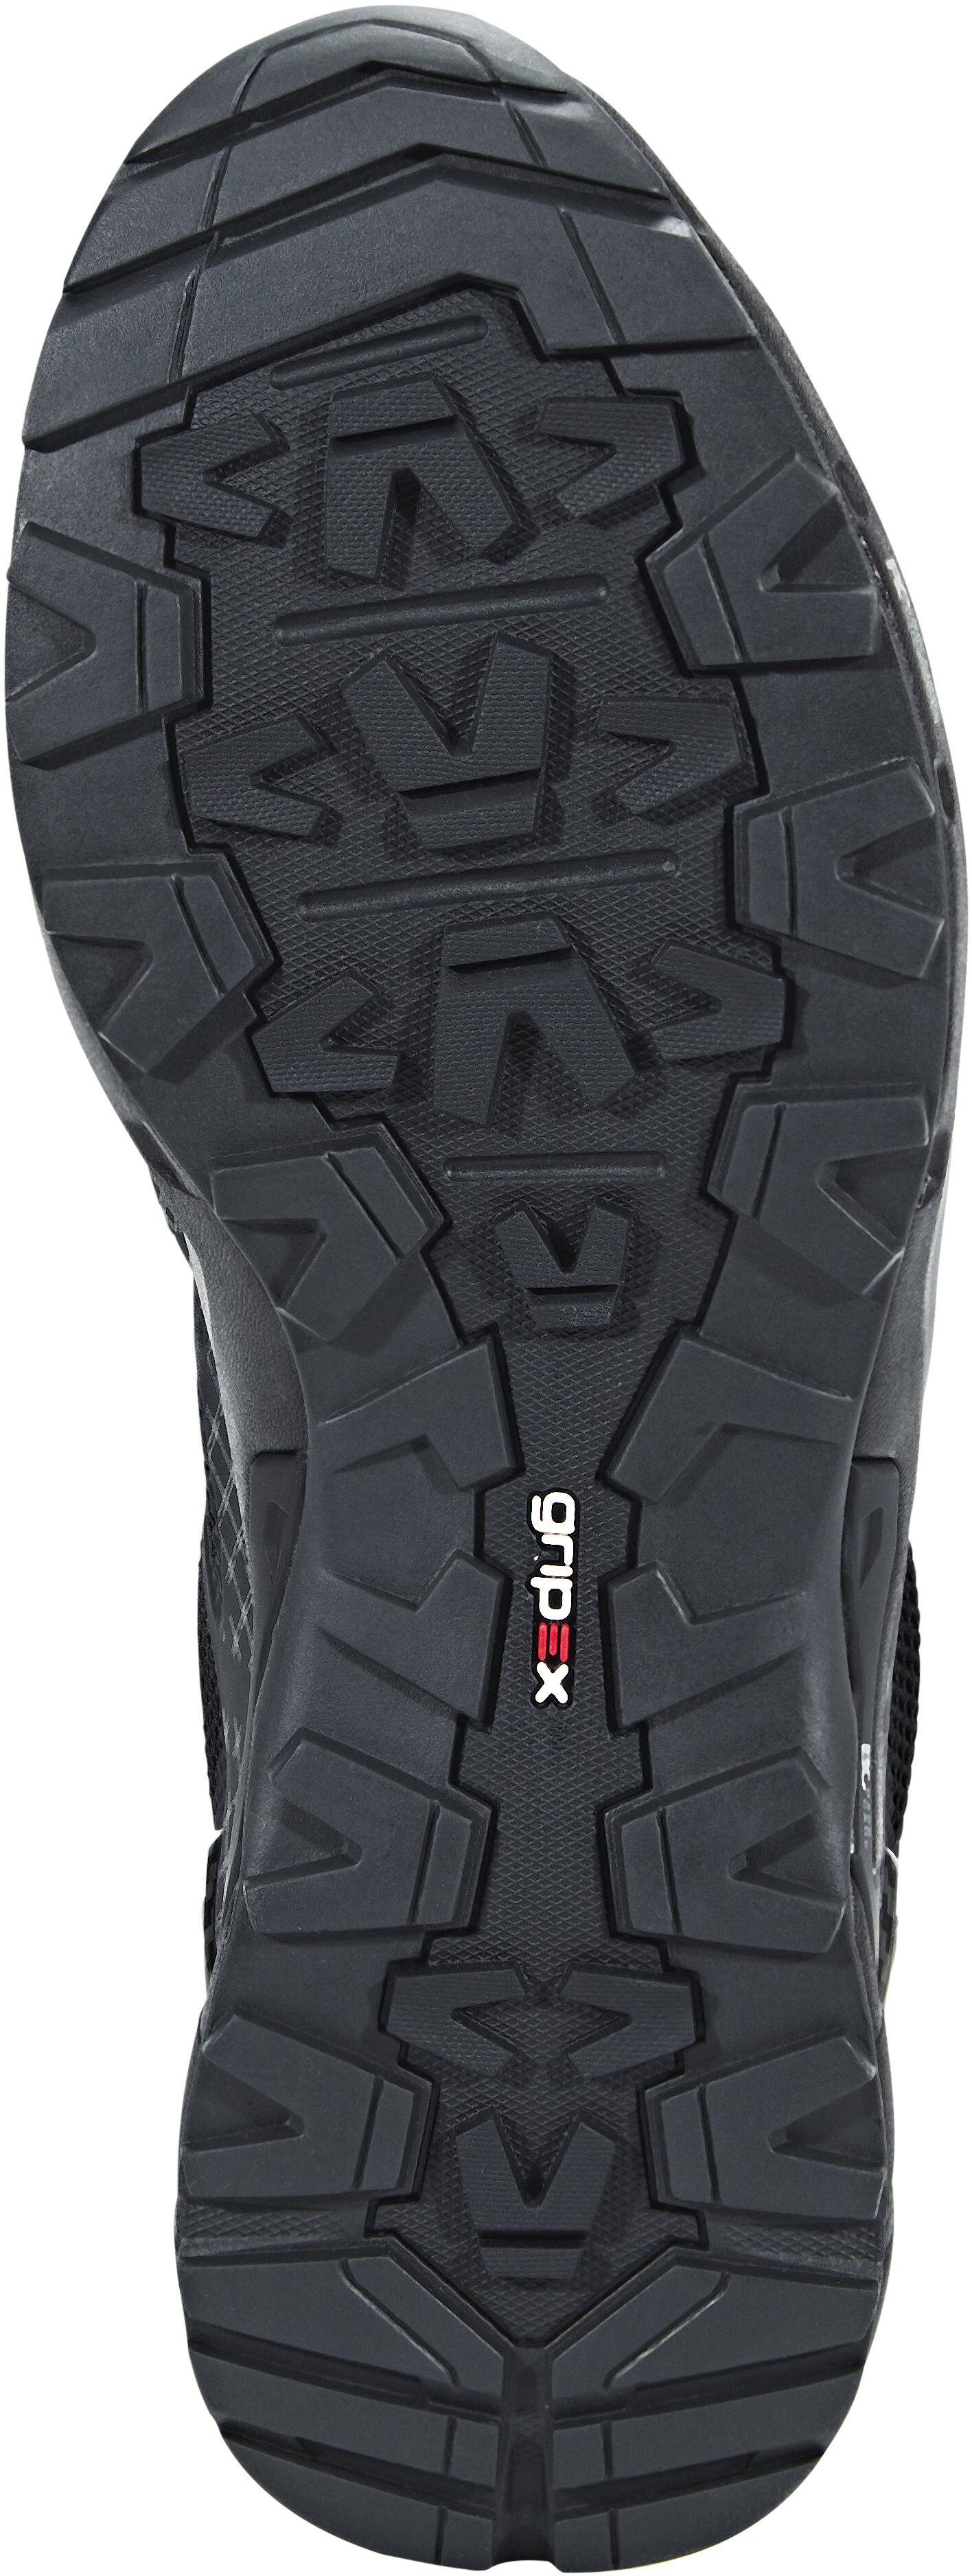 ee9a4e8f5a59f7 Mammut T Aenergy Low GTX Shoes Men black-dark lava